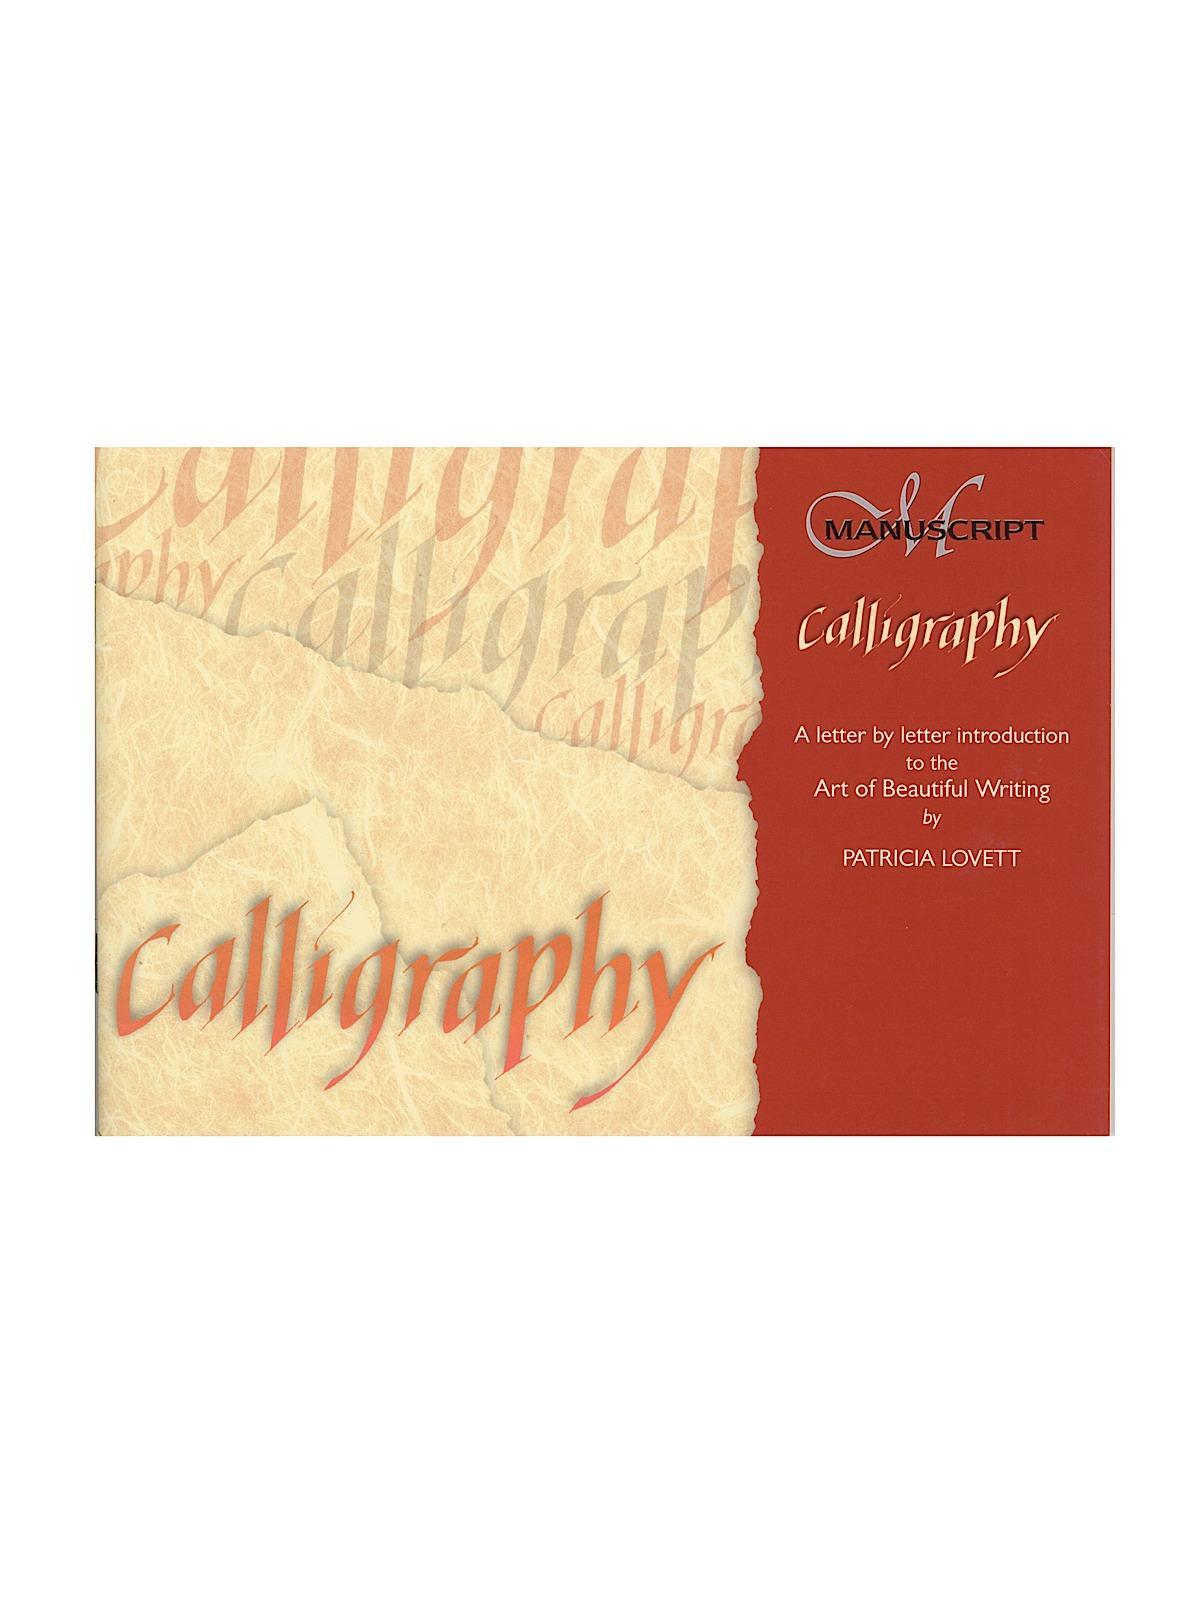 Manuscript calligraphy manual misterart